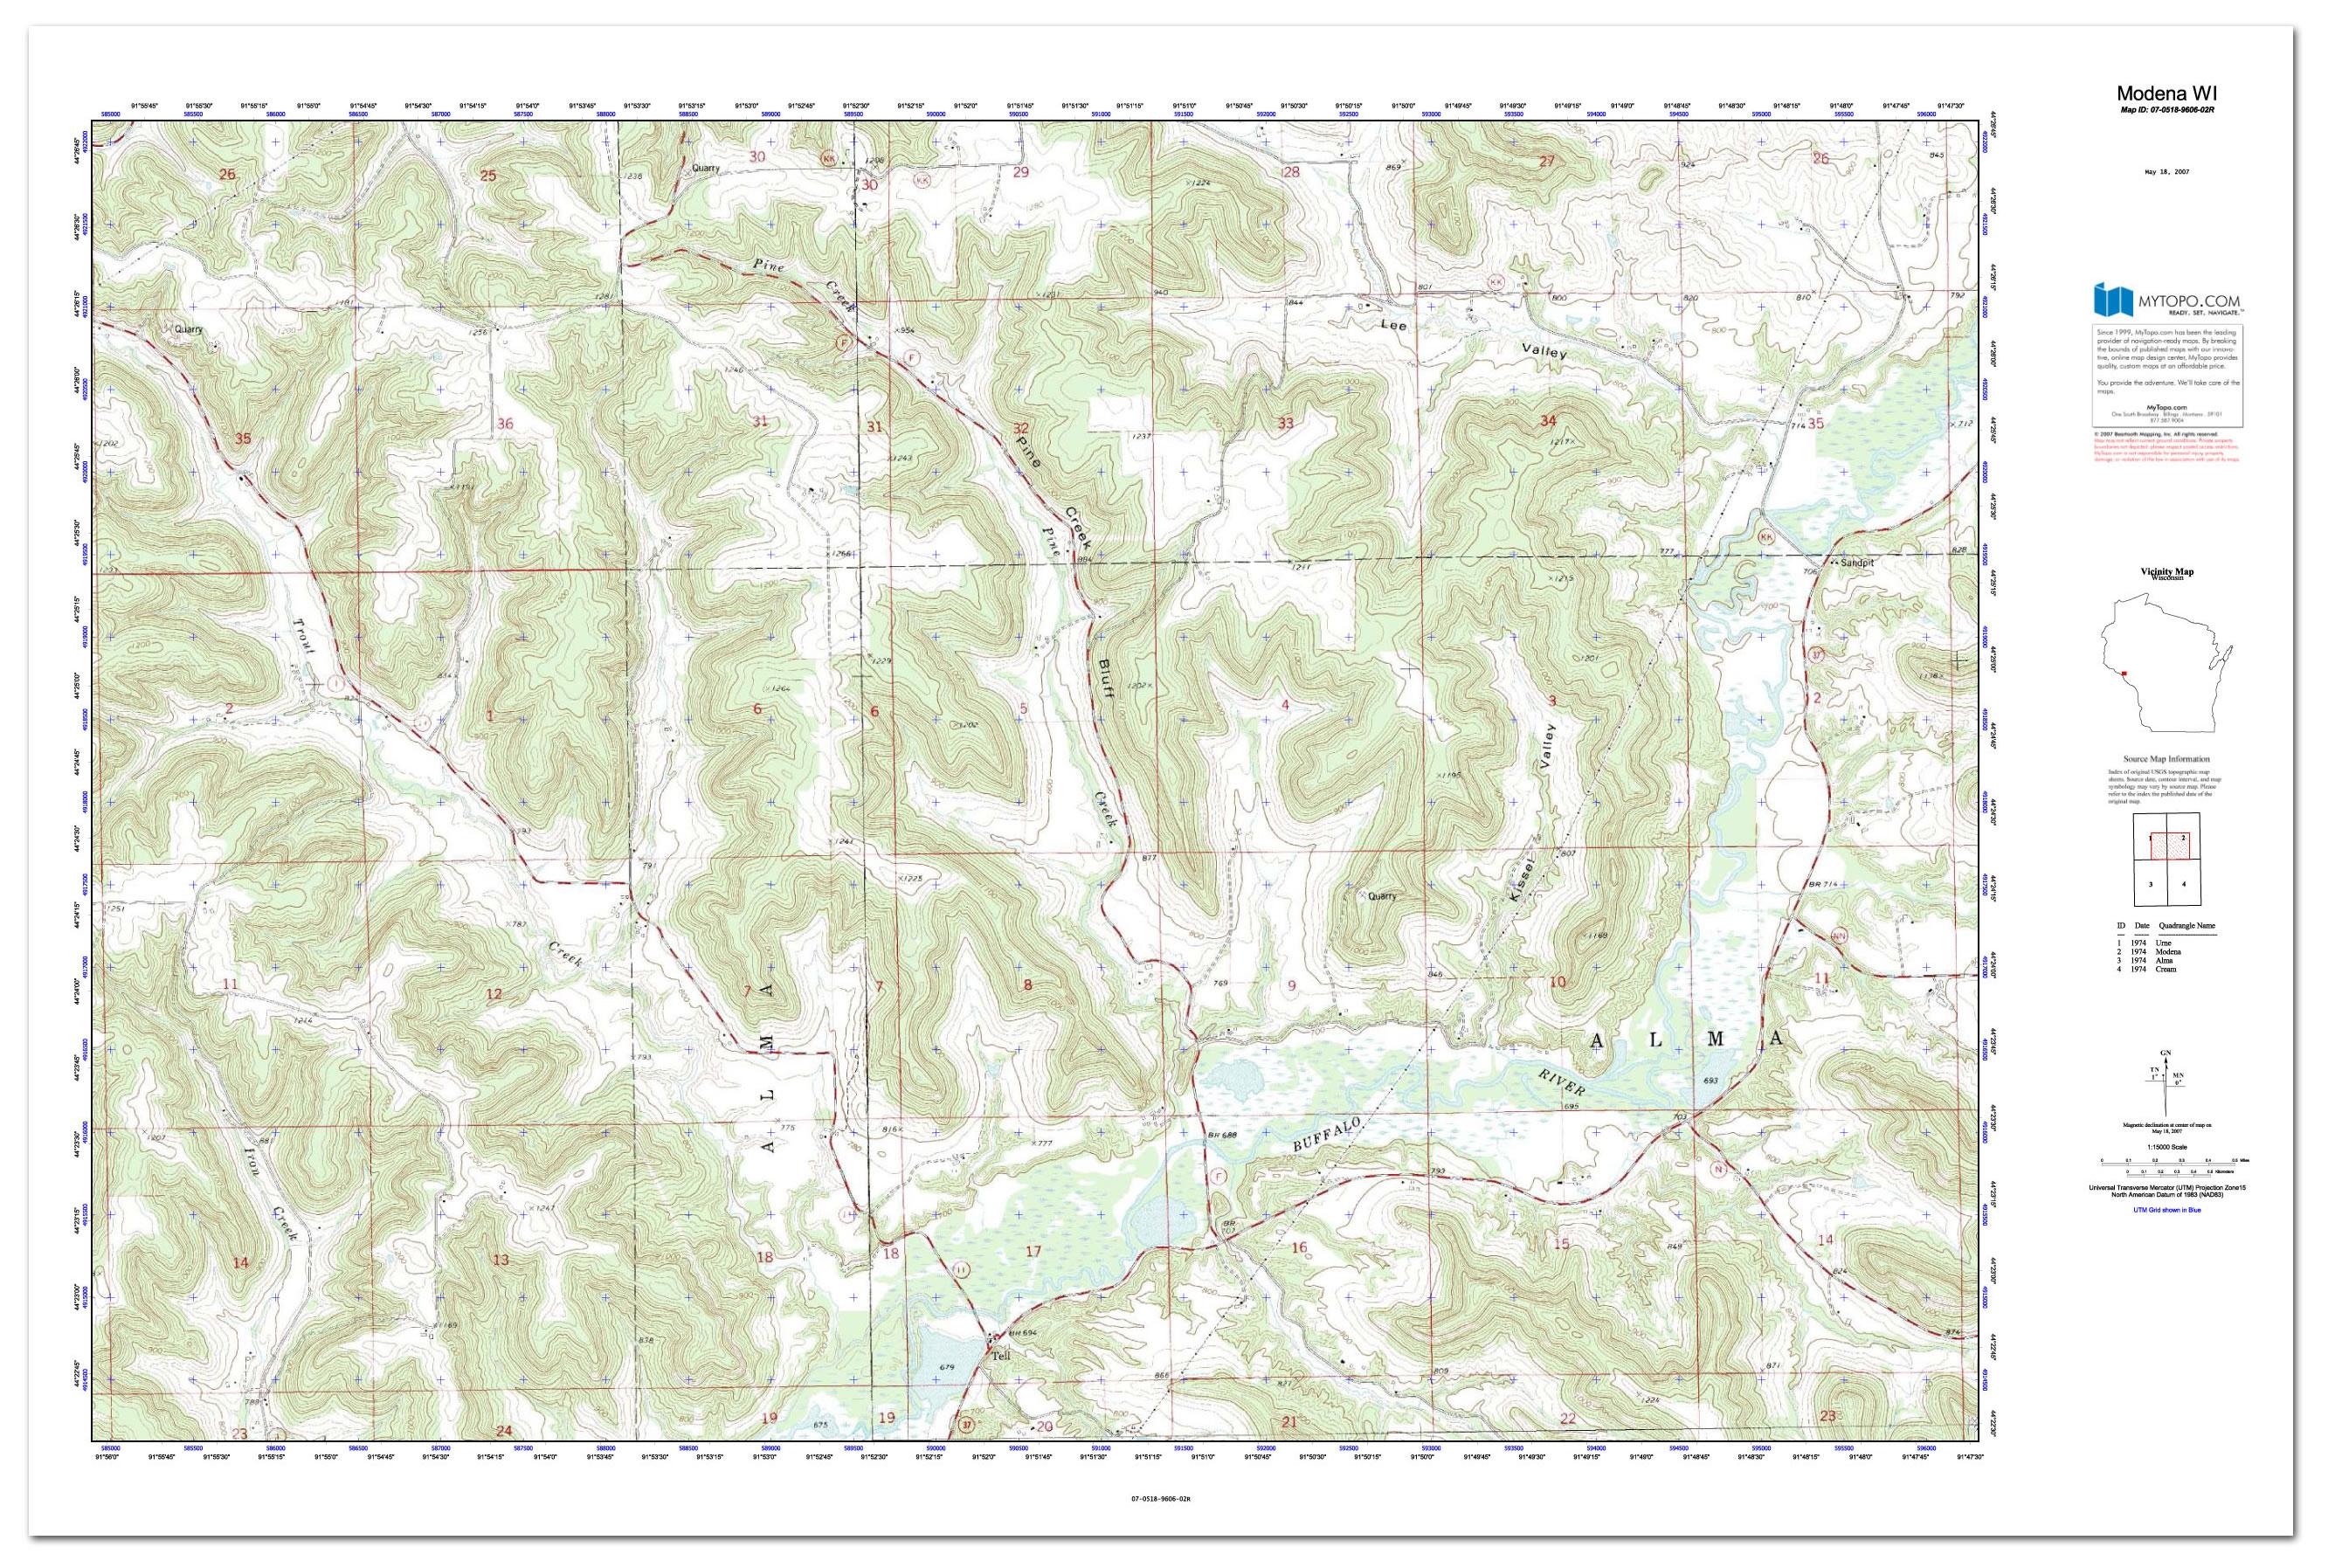 Custom Printed Topo Maps - Custom Printed Aerial Photos - Printable Topo Maps Online